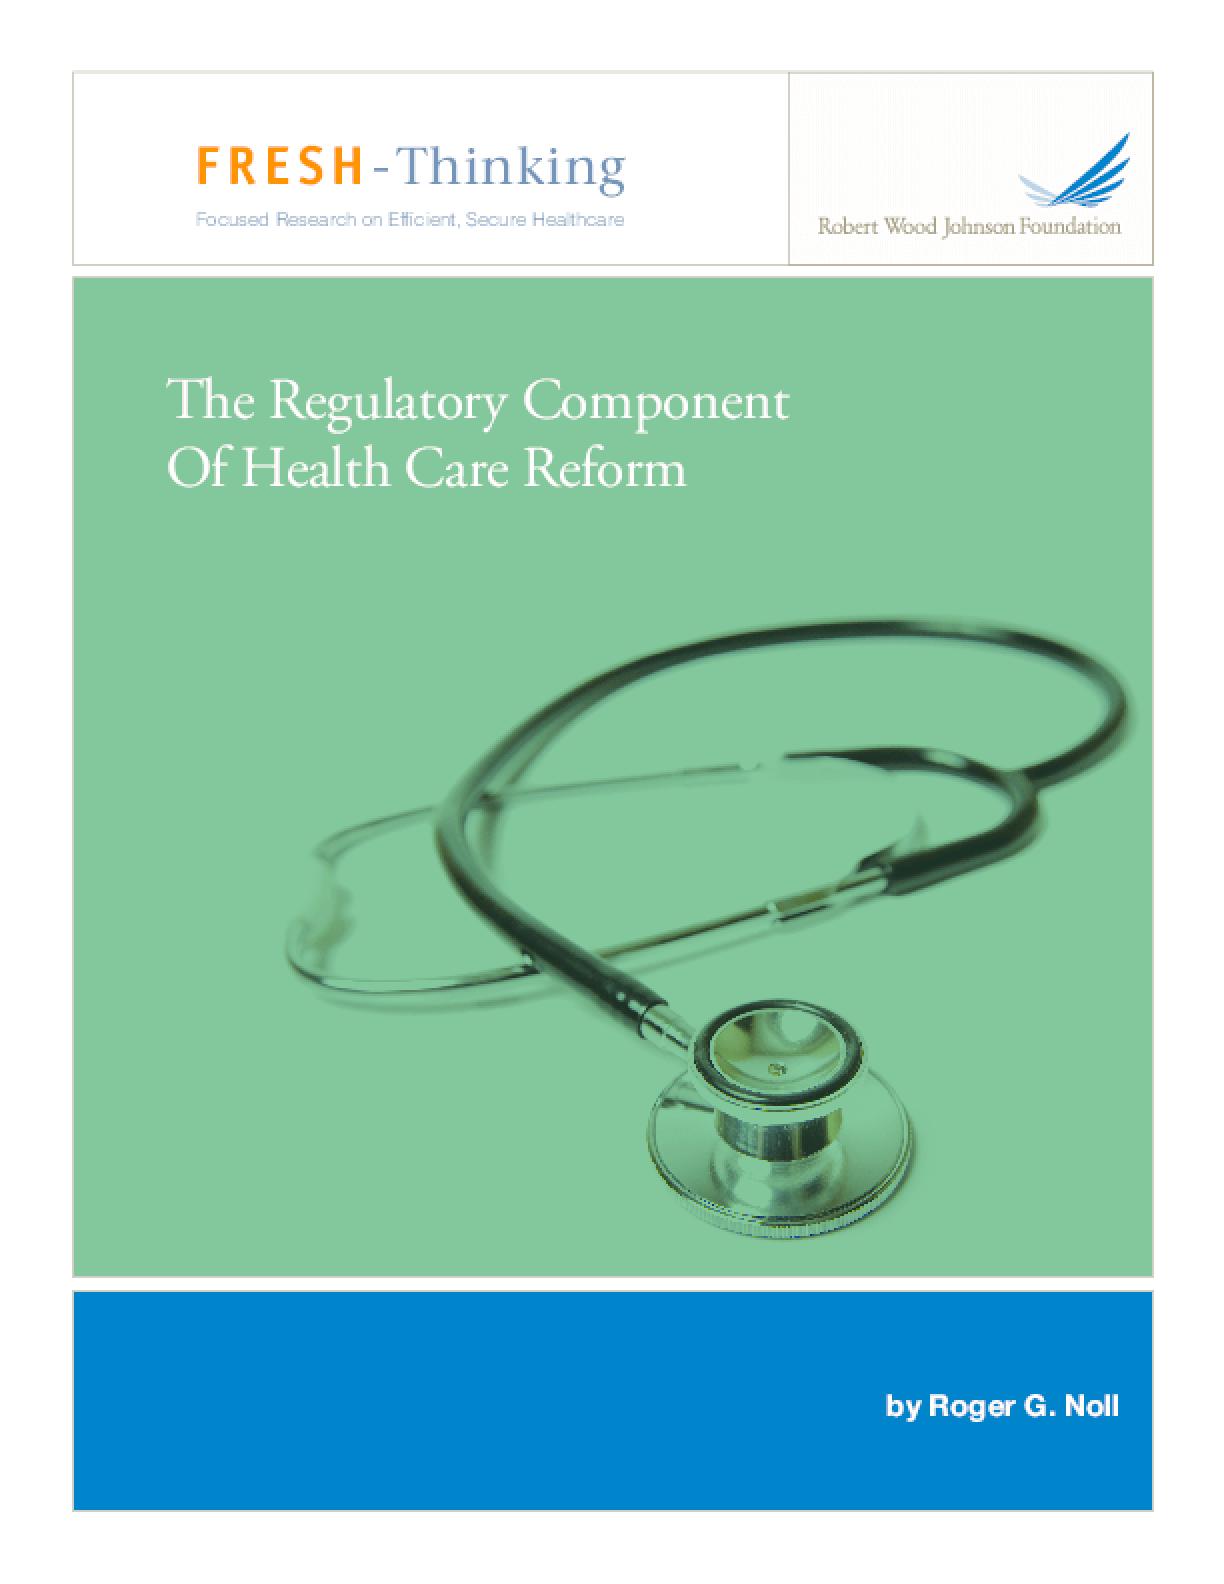 The Regulatory Component of Health Care Reform